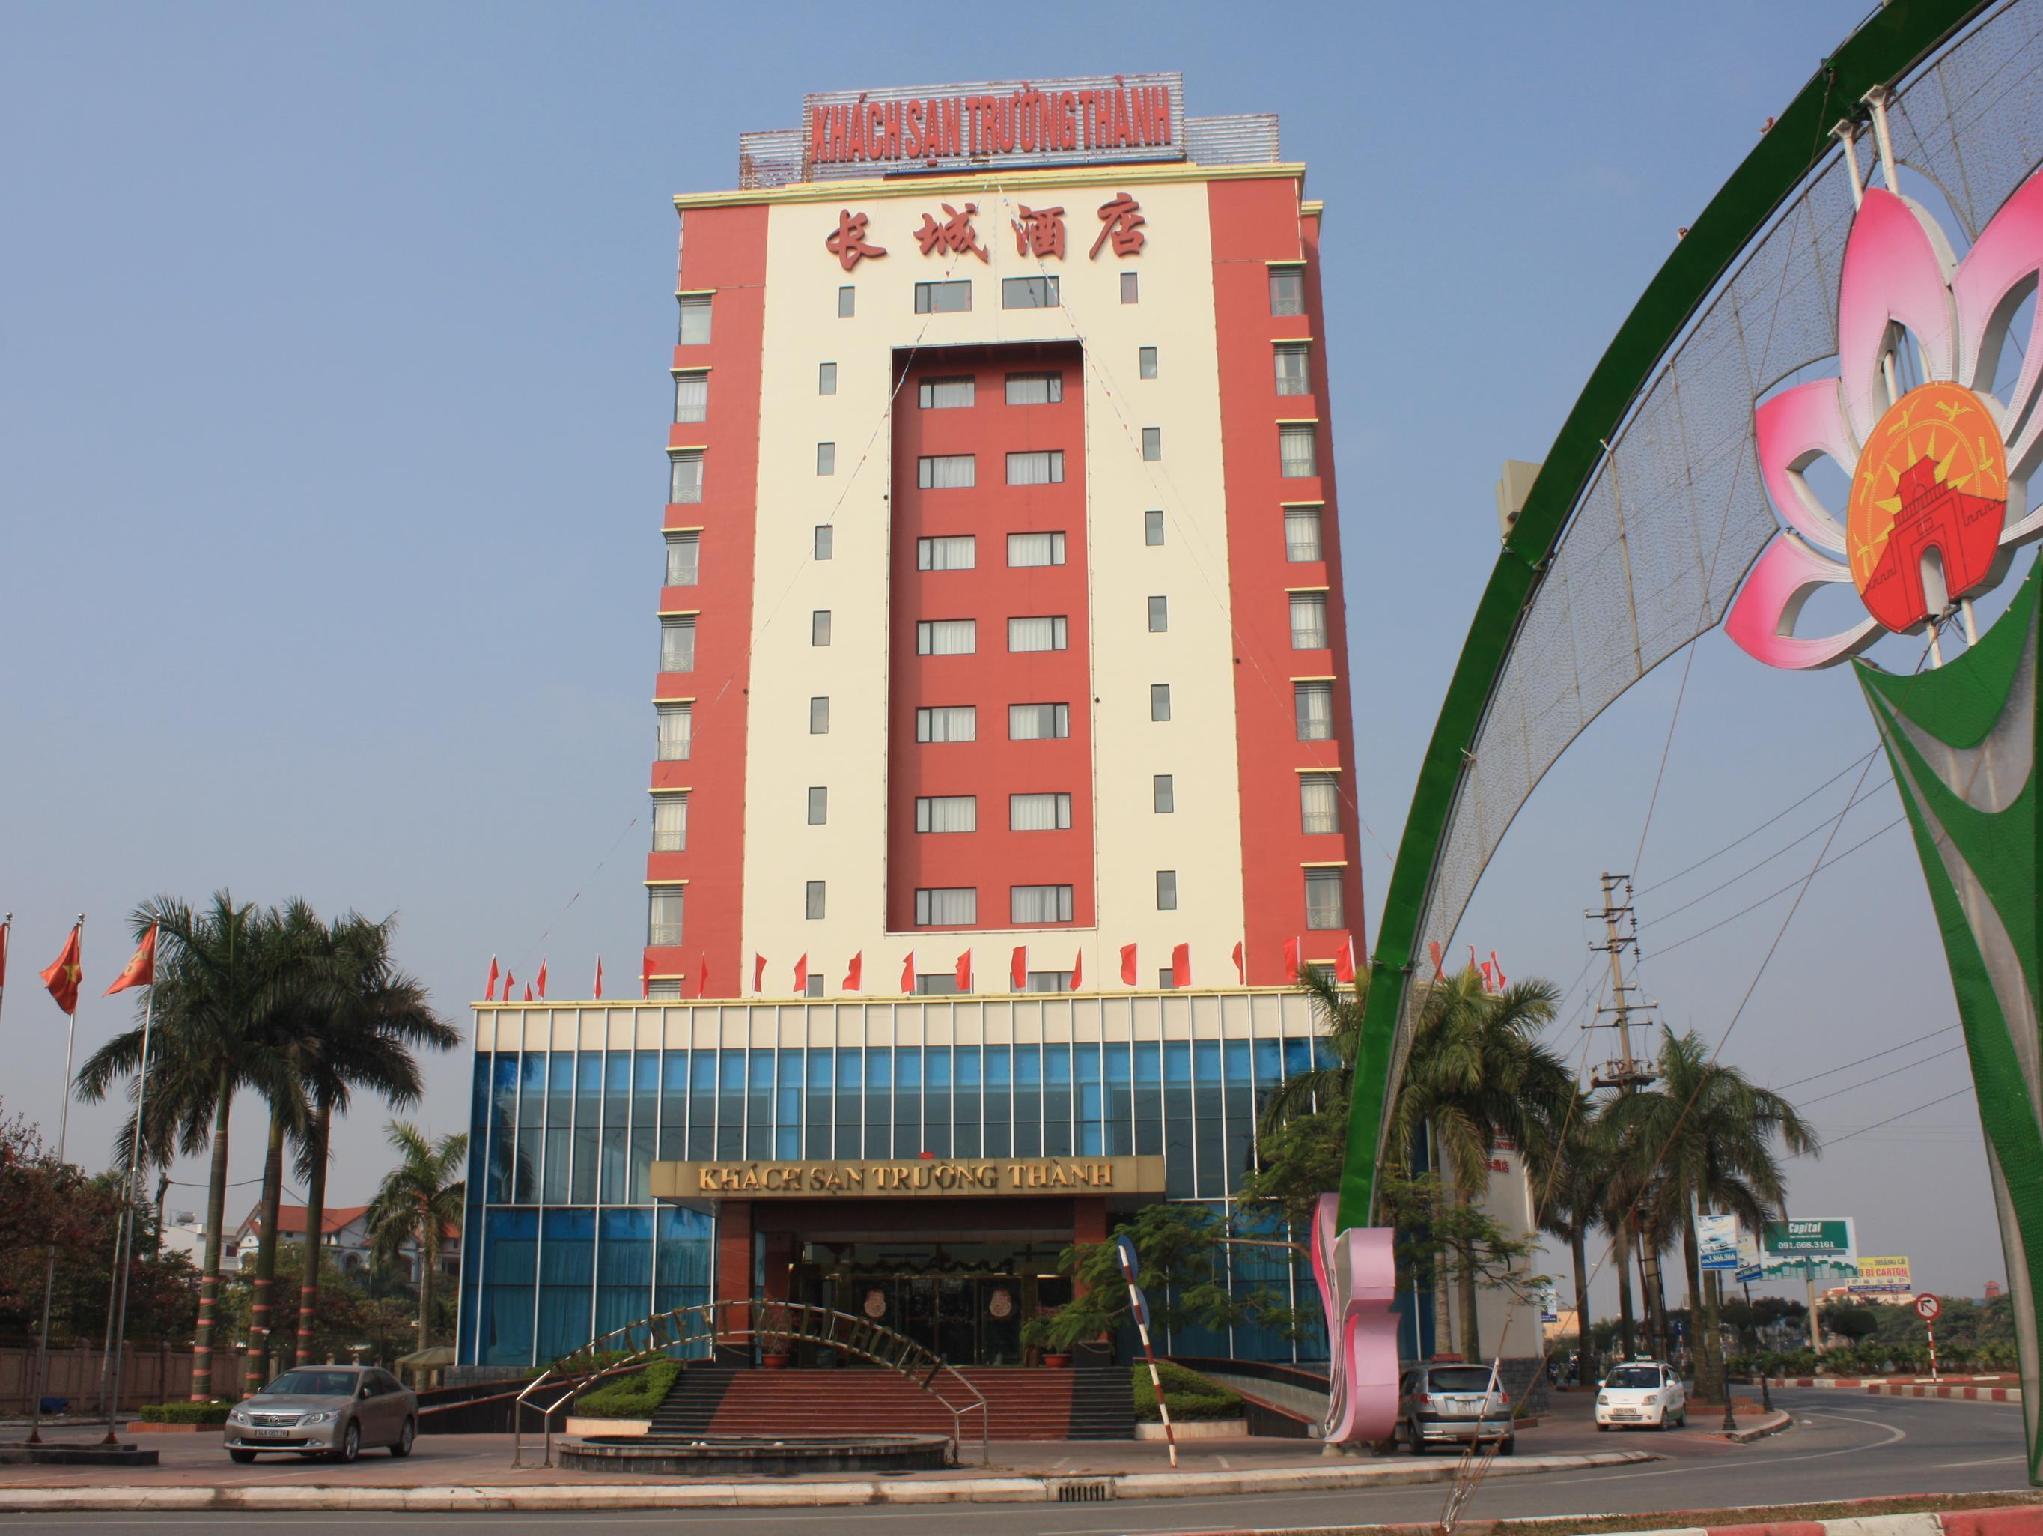 The Great Wall HNA Hotel - Hotell och Boende i Vietnam , Hai Duong